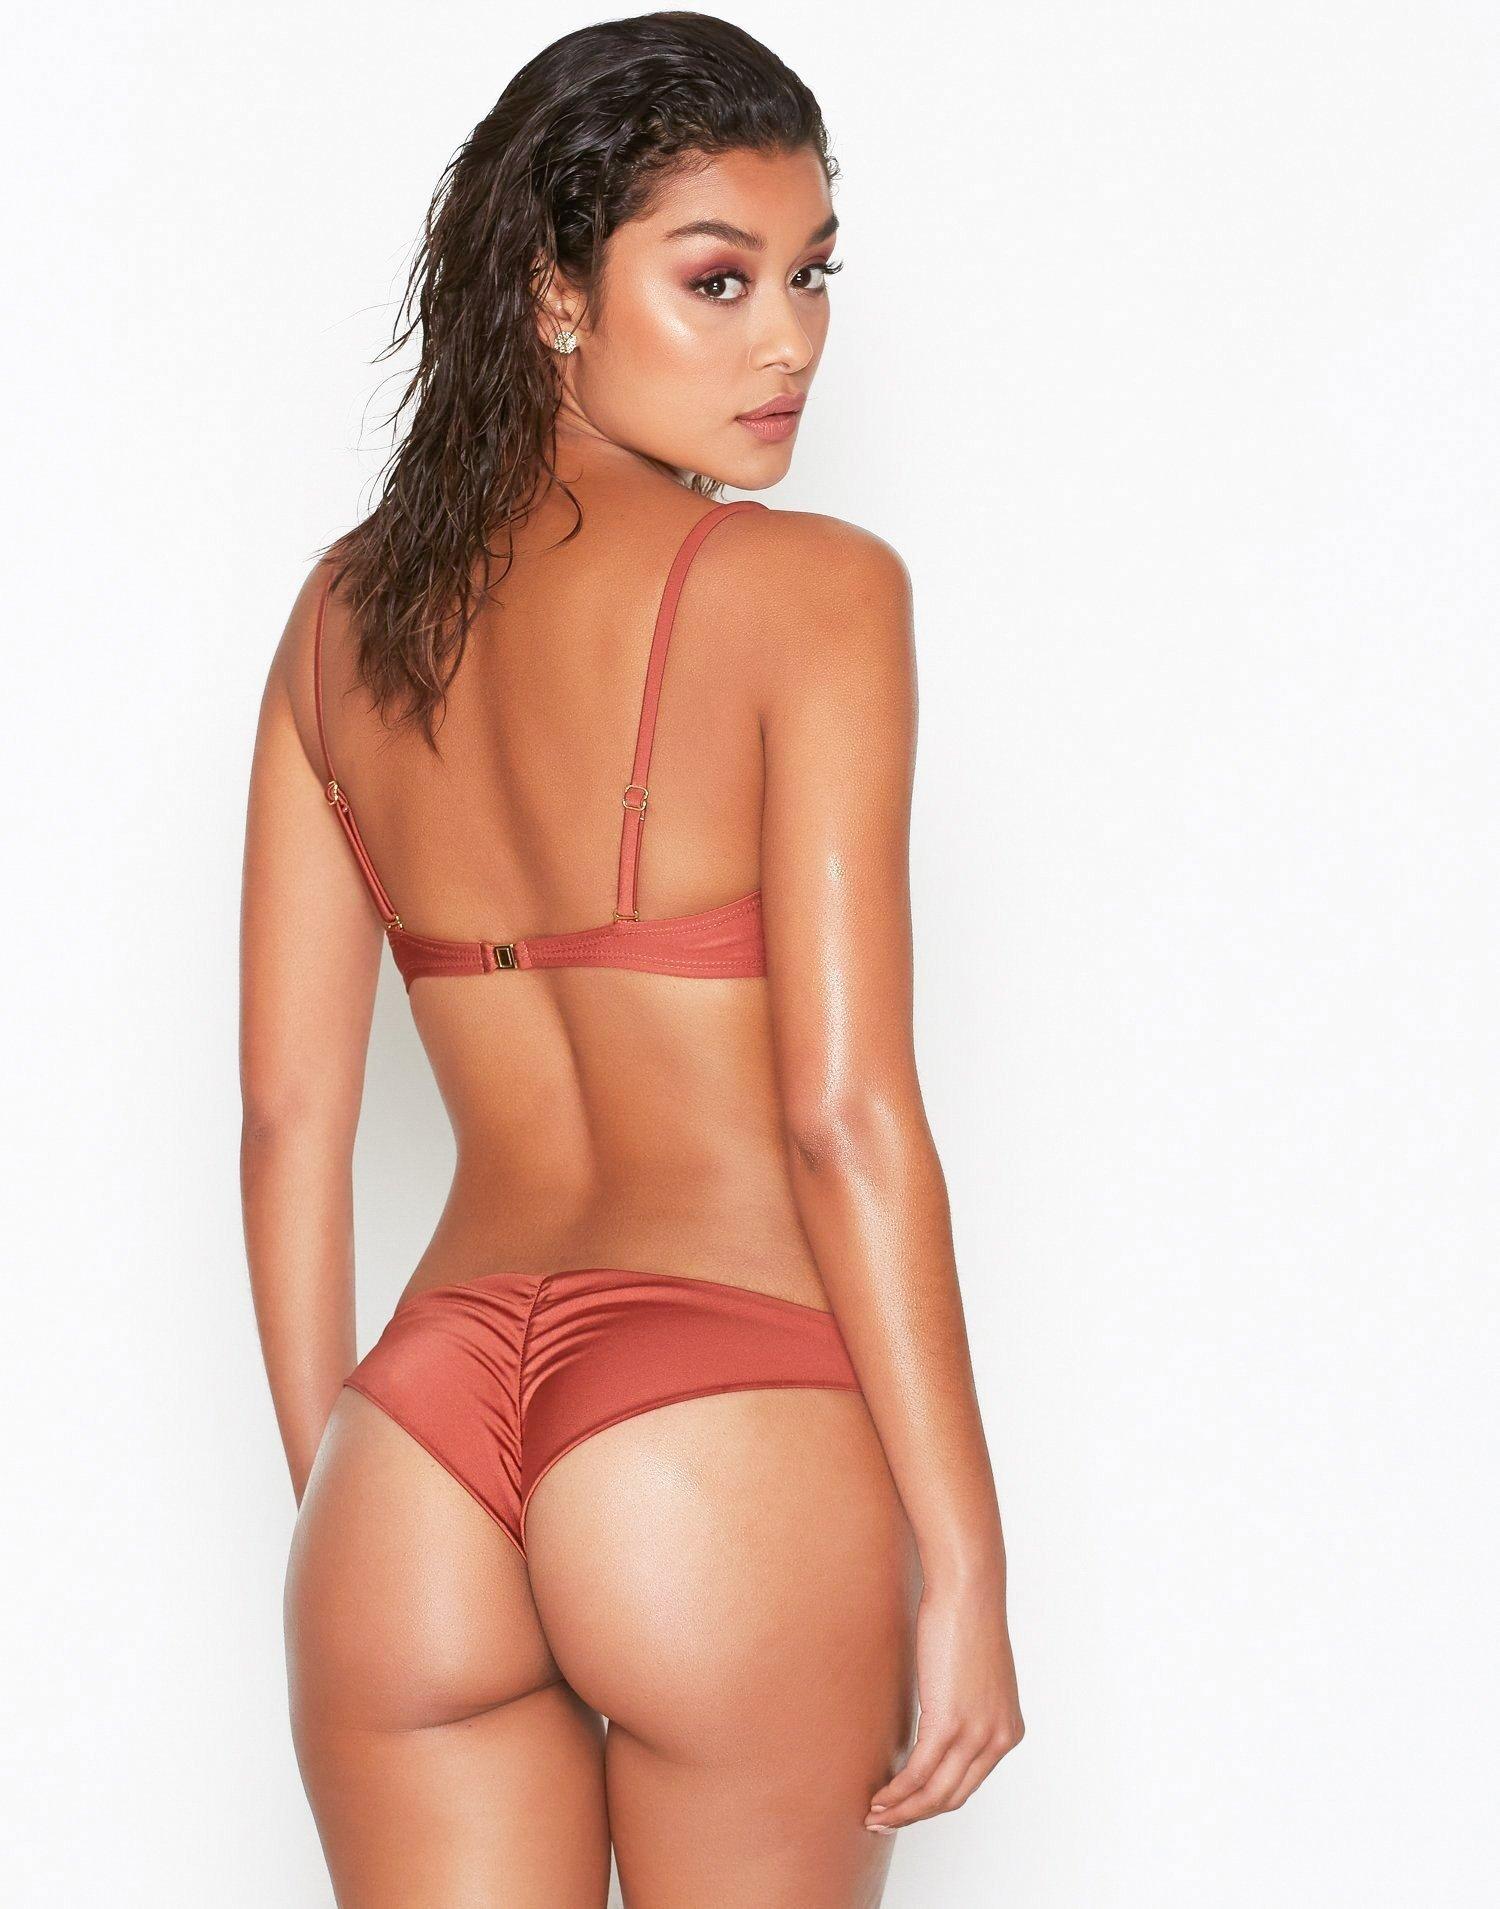 Liv tyler bikini pics